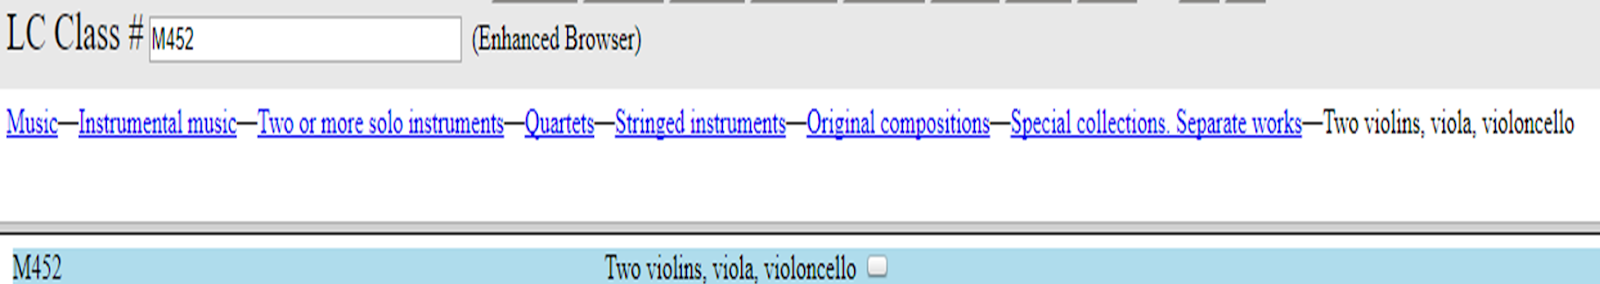 Figure 4: classification for string quartets (two violins, viola, violoncello).  Source: www.classificationweb.net.